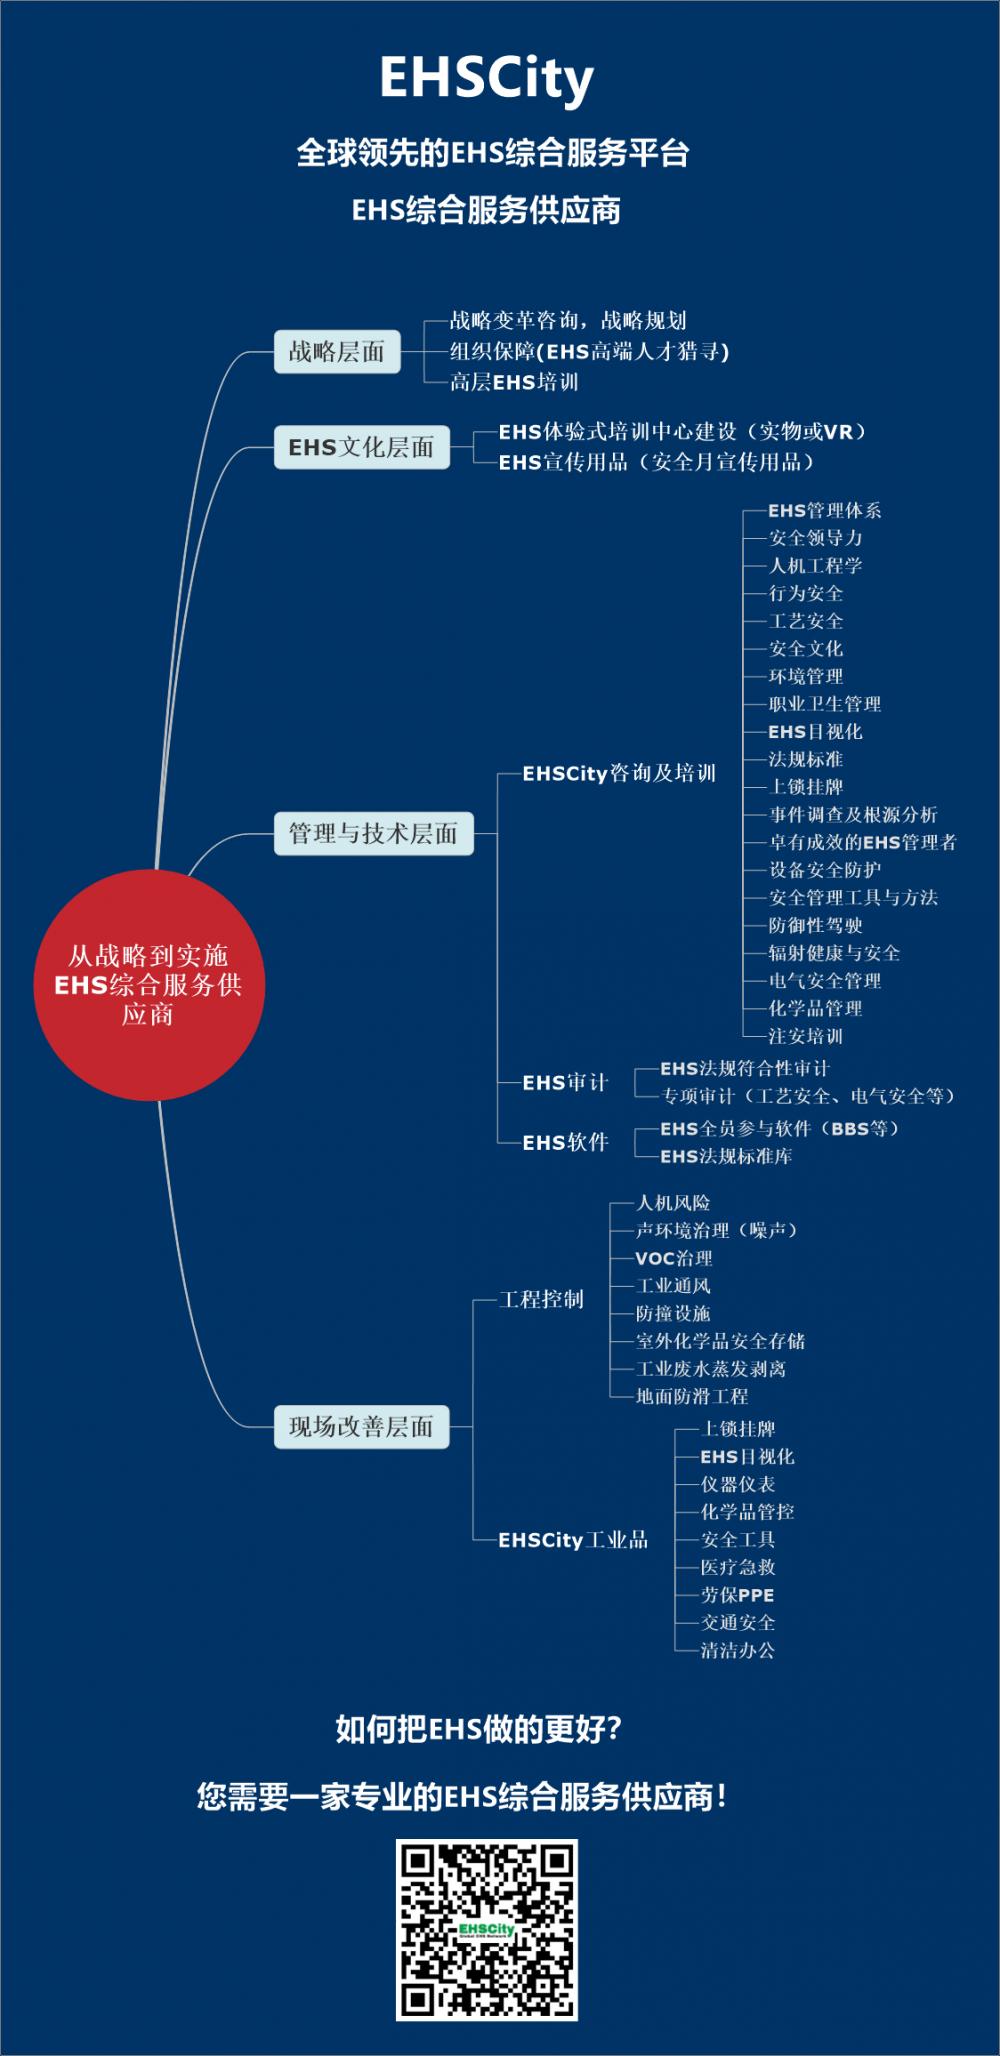 EHSCity综合服务供应商2018.2